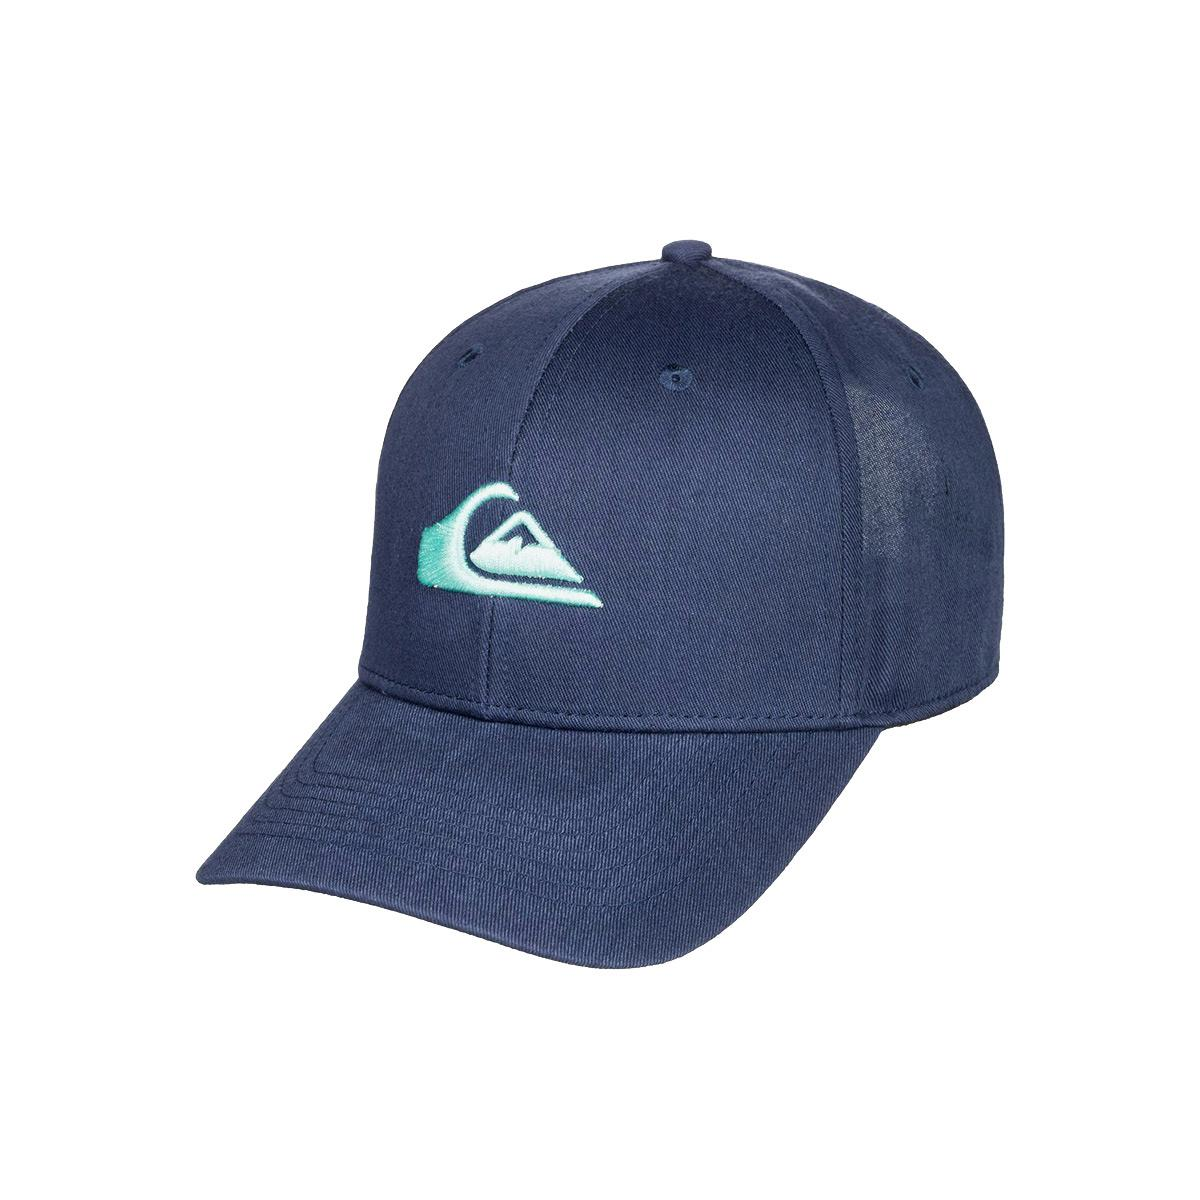 Quksilver Decades HDWR Şapka AQYHA04002-BSM0